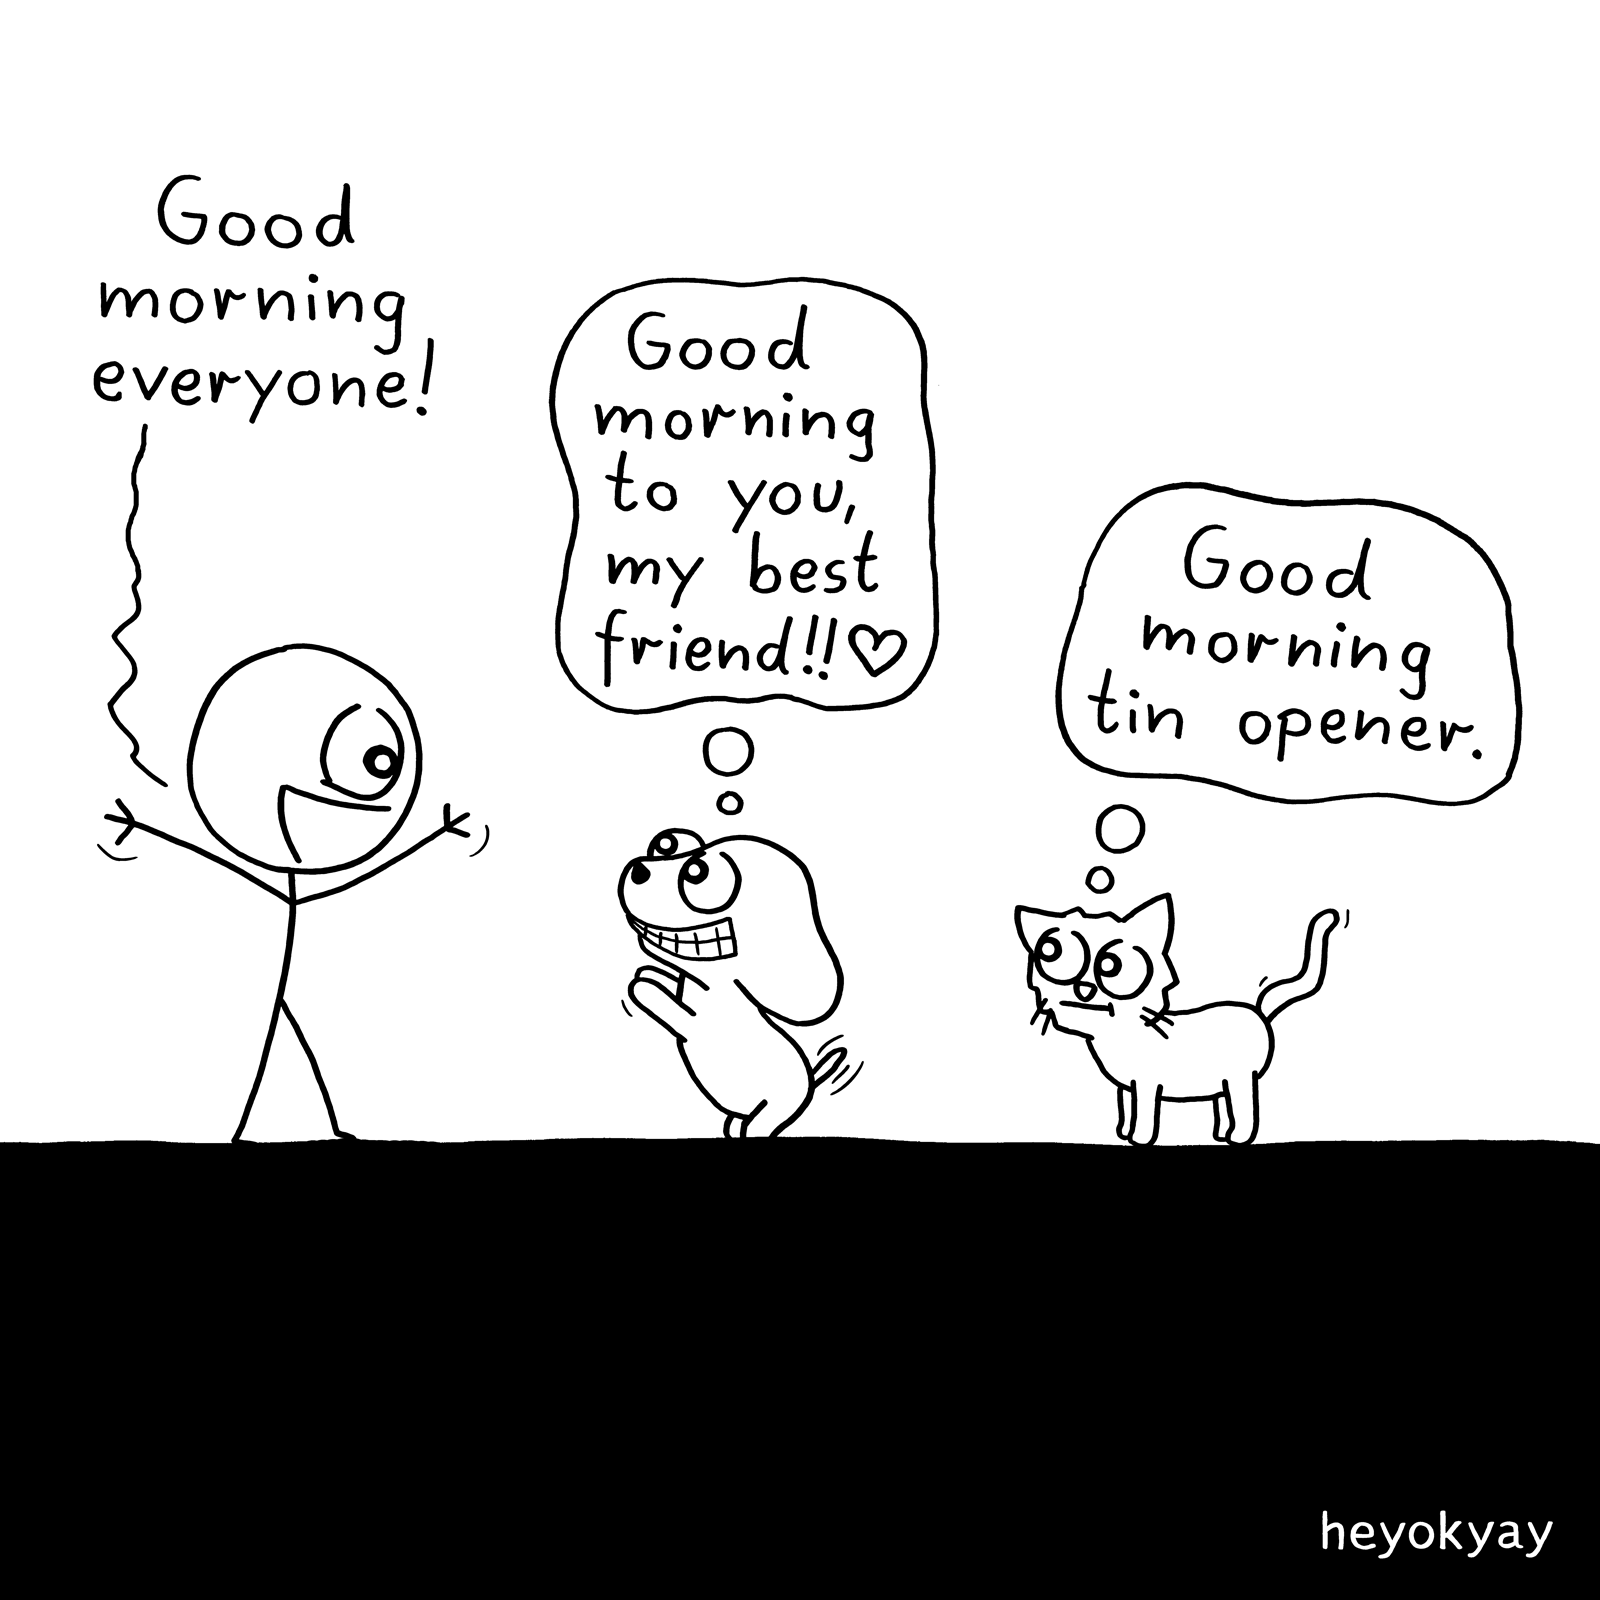 Good Morning! heyokyay comic